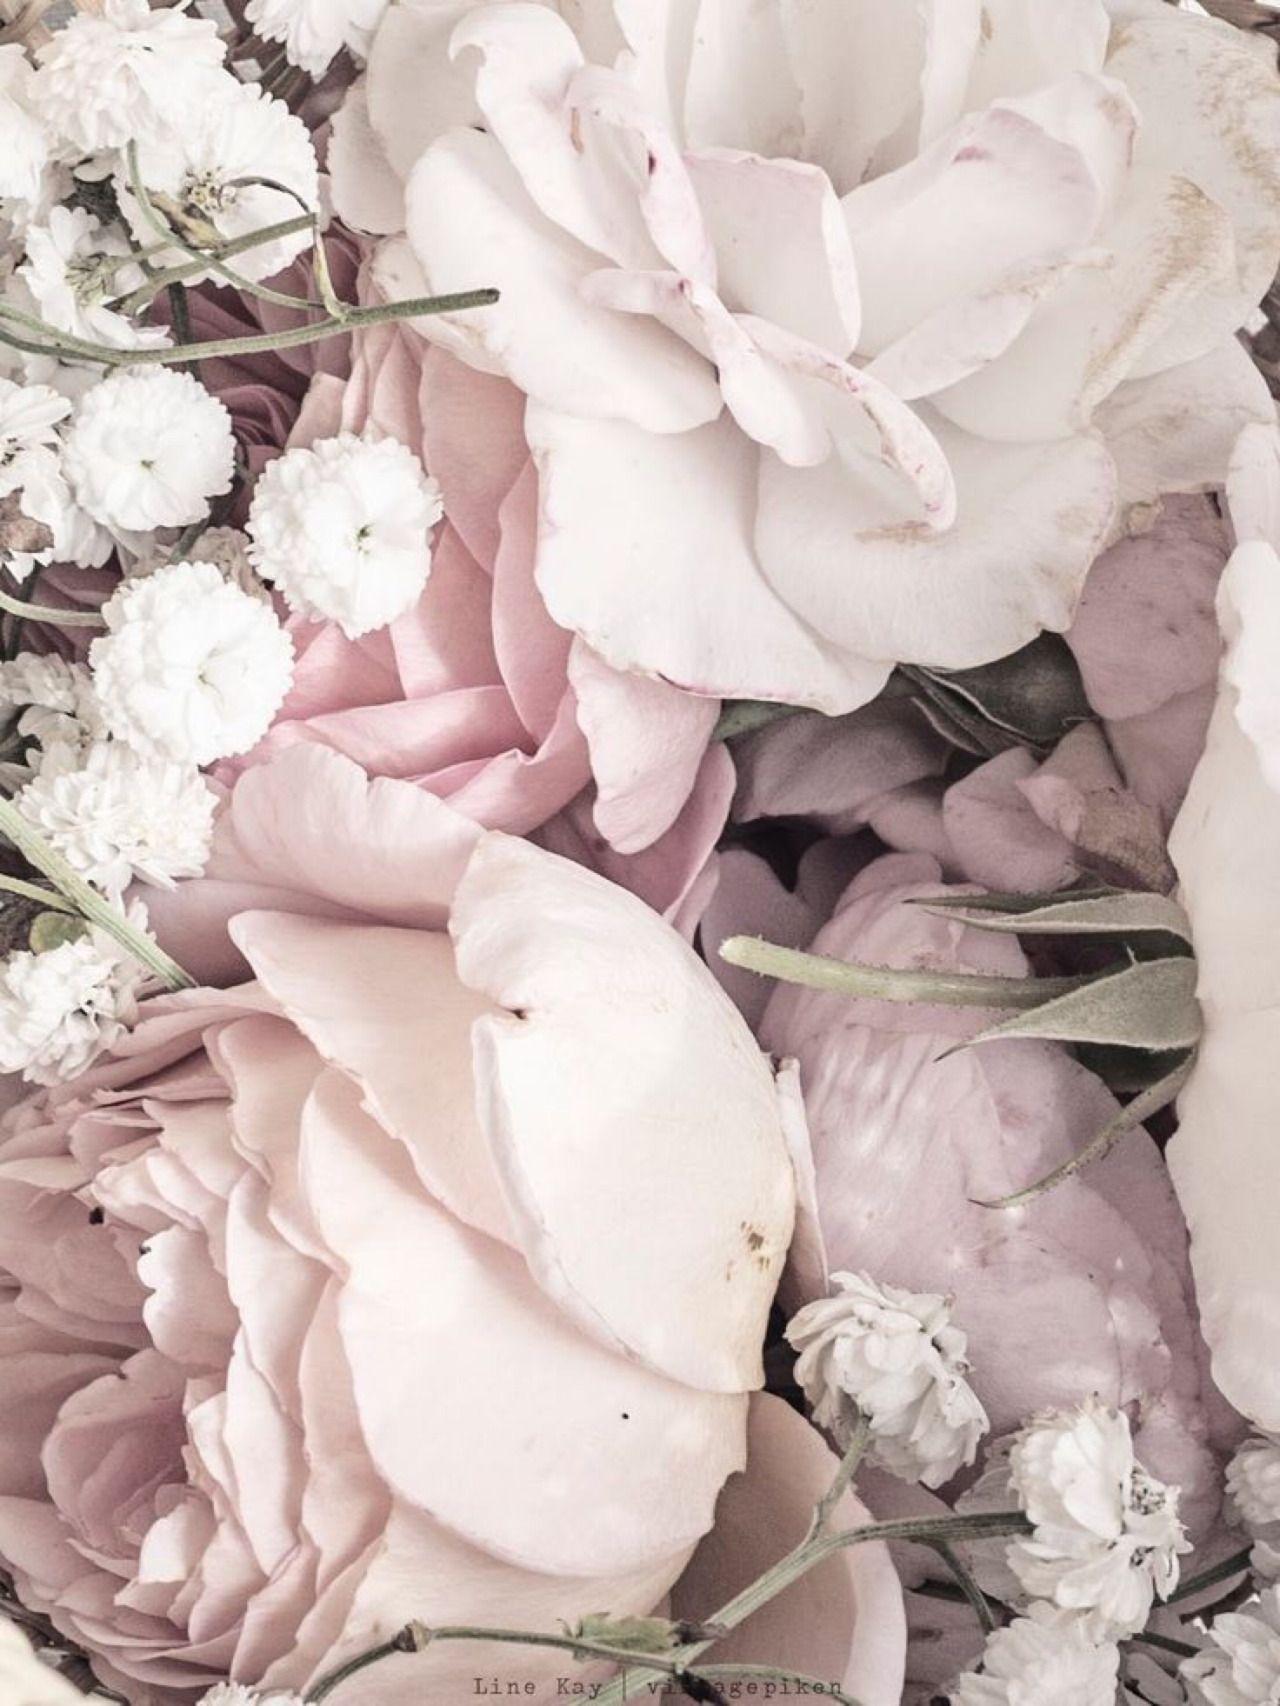 Zsazsabellagiotumblr Post 131790343933 White FlowersPretty FlowersPink